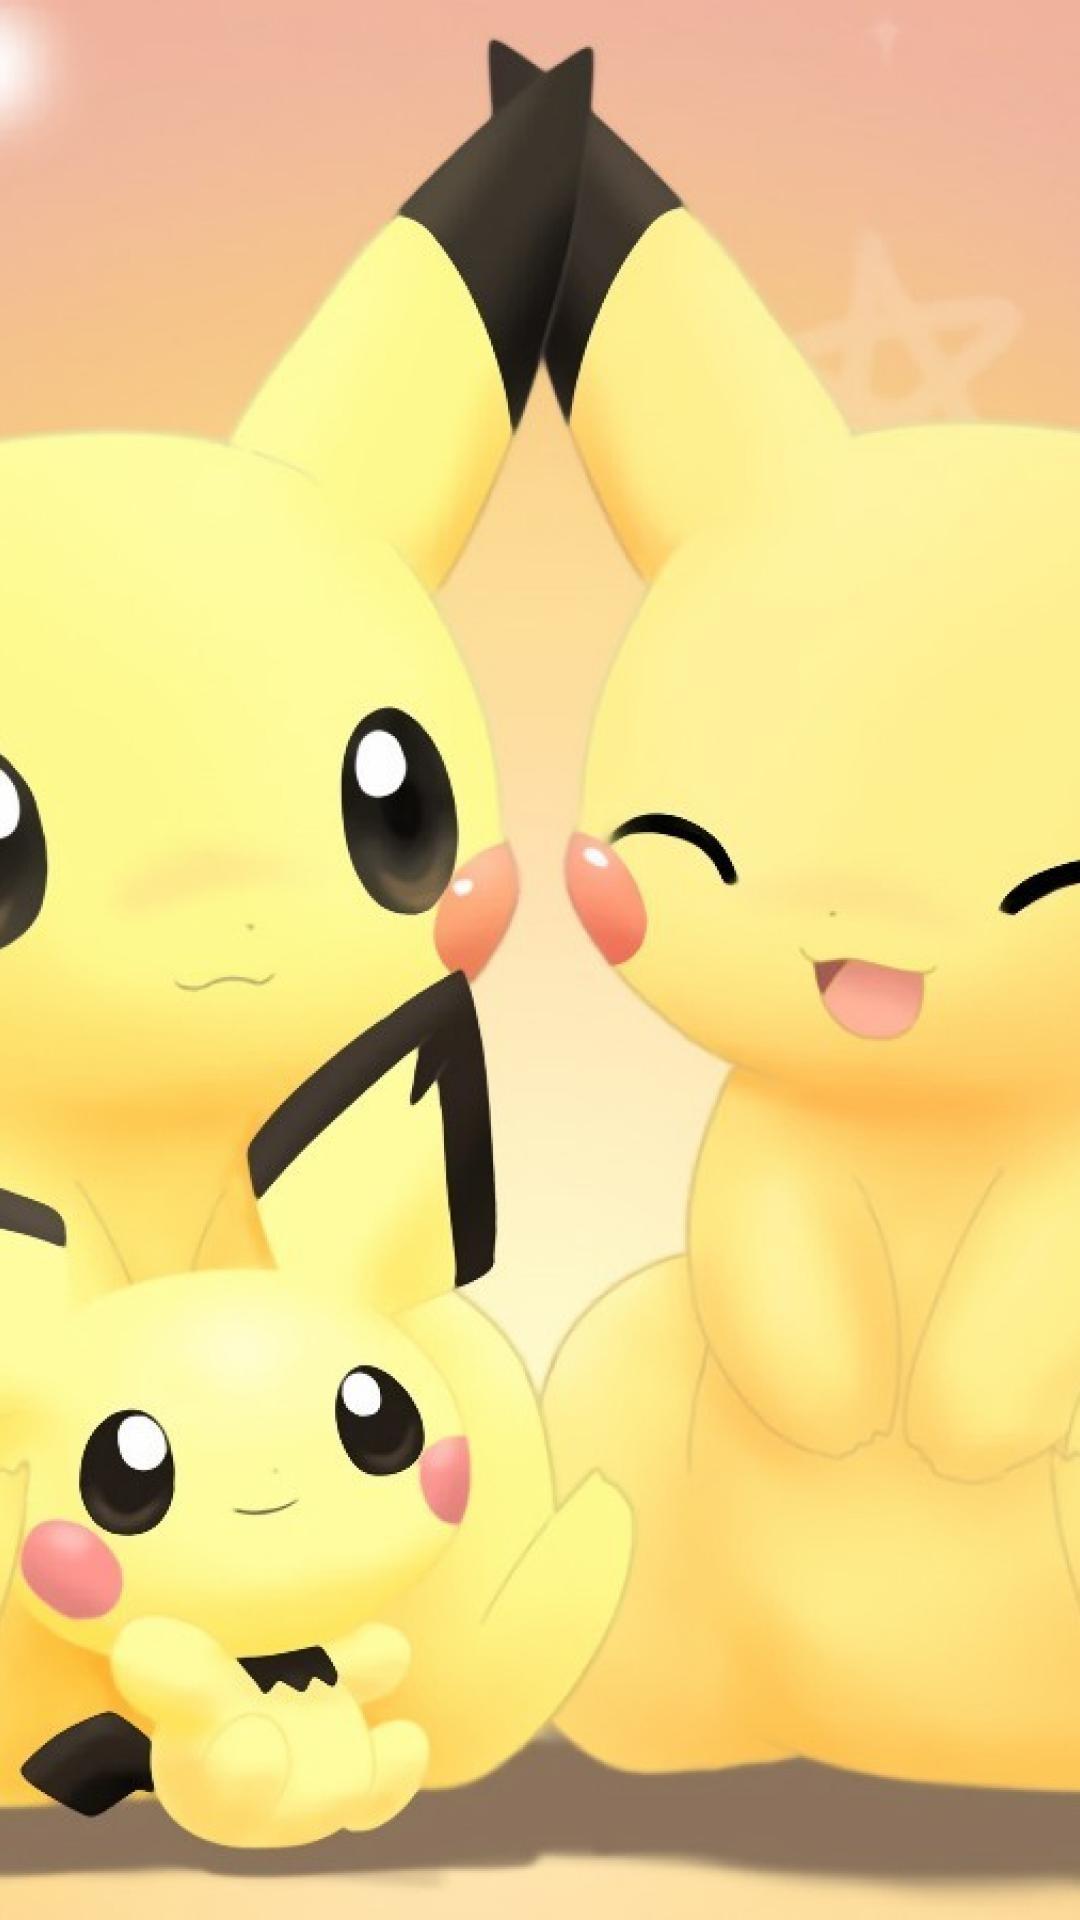 download-pokemon-iphone-backgrounds-wallpaper-hd-08